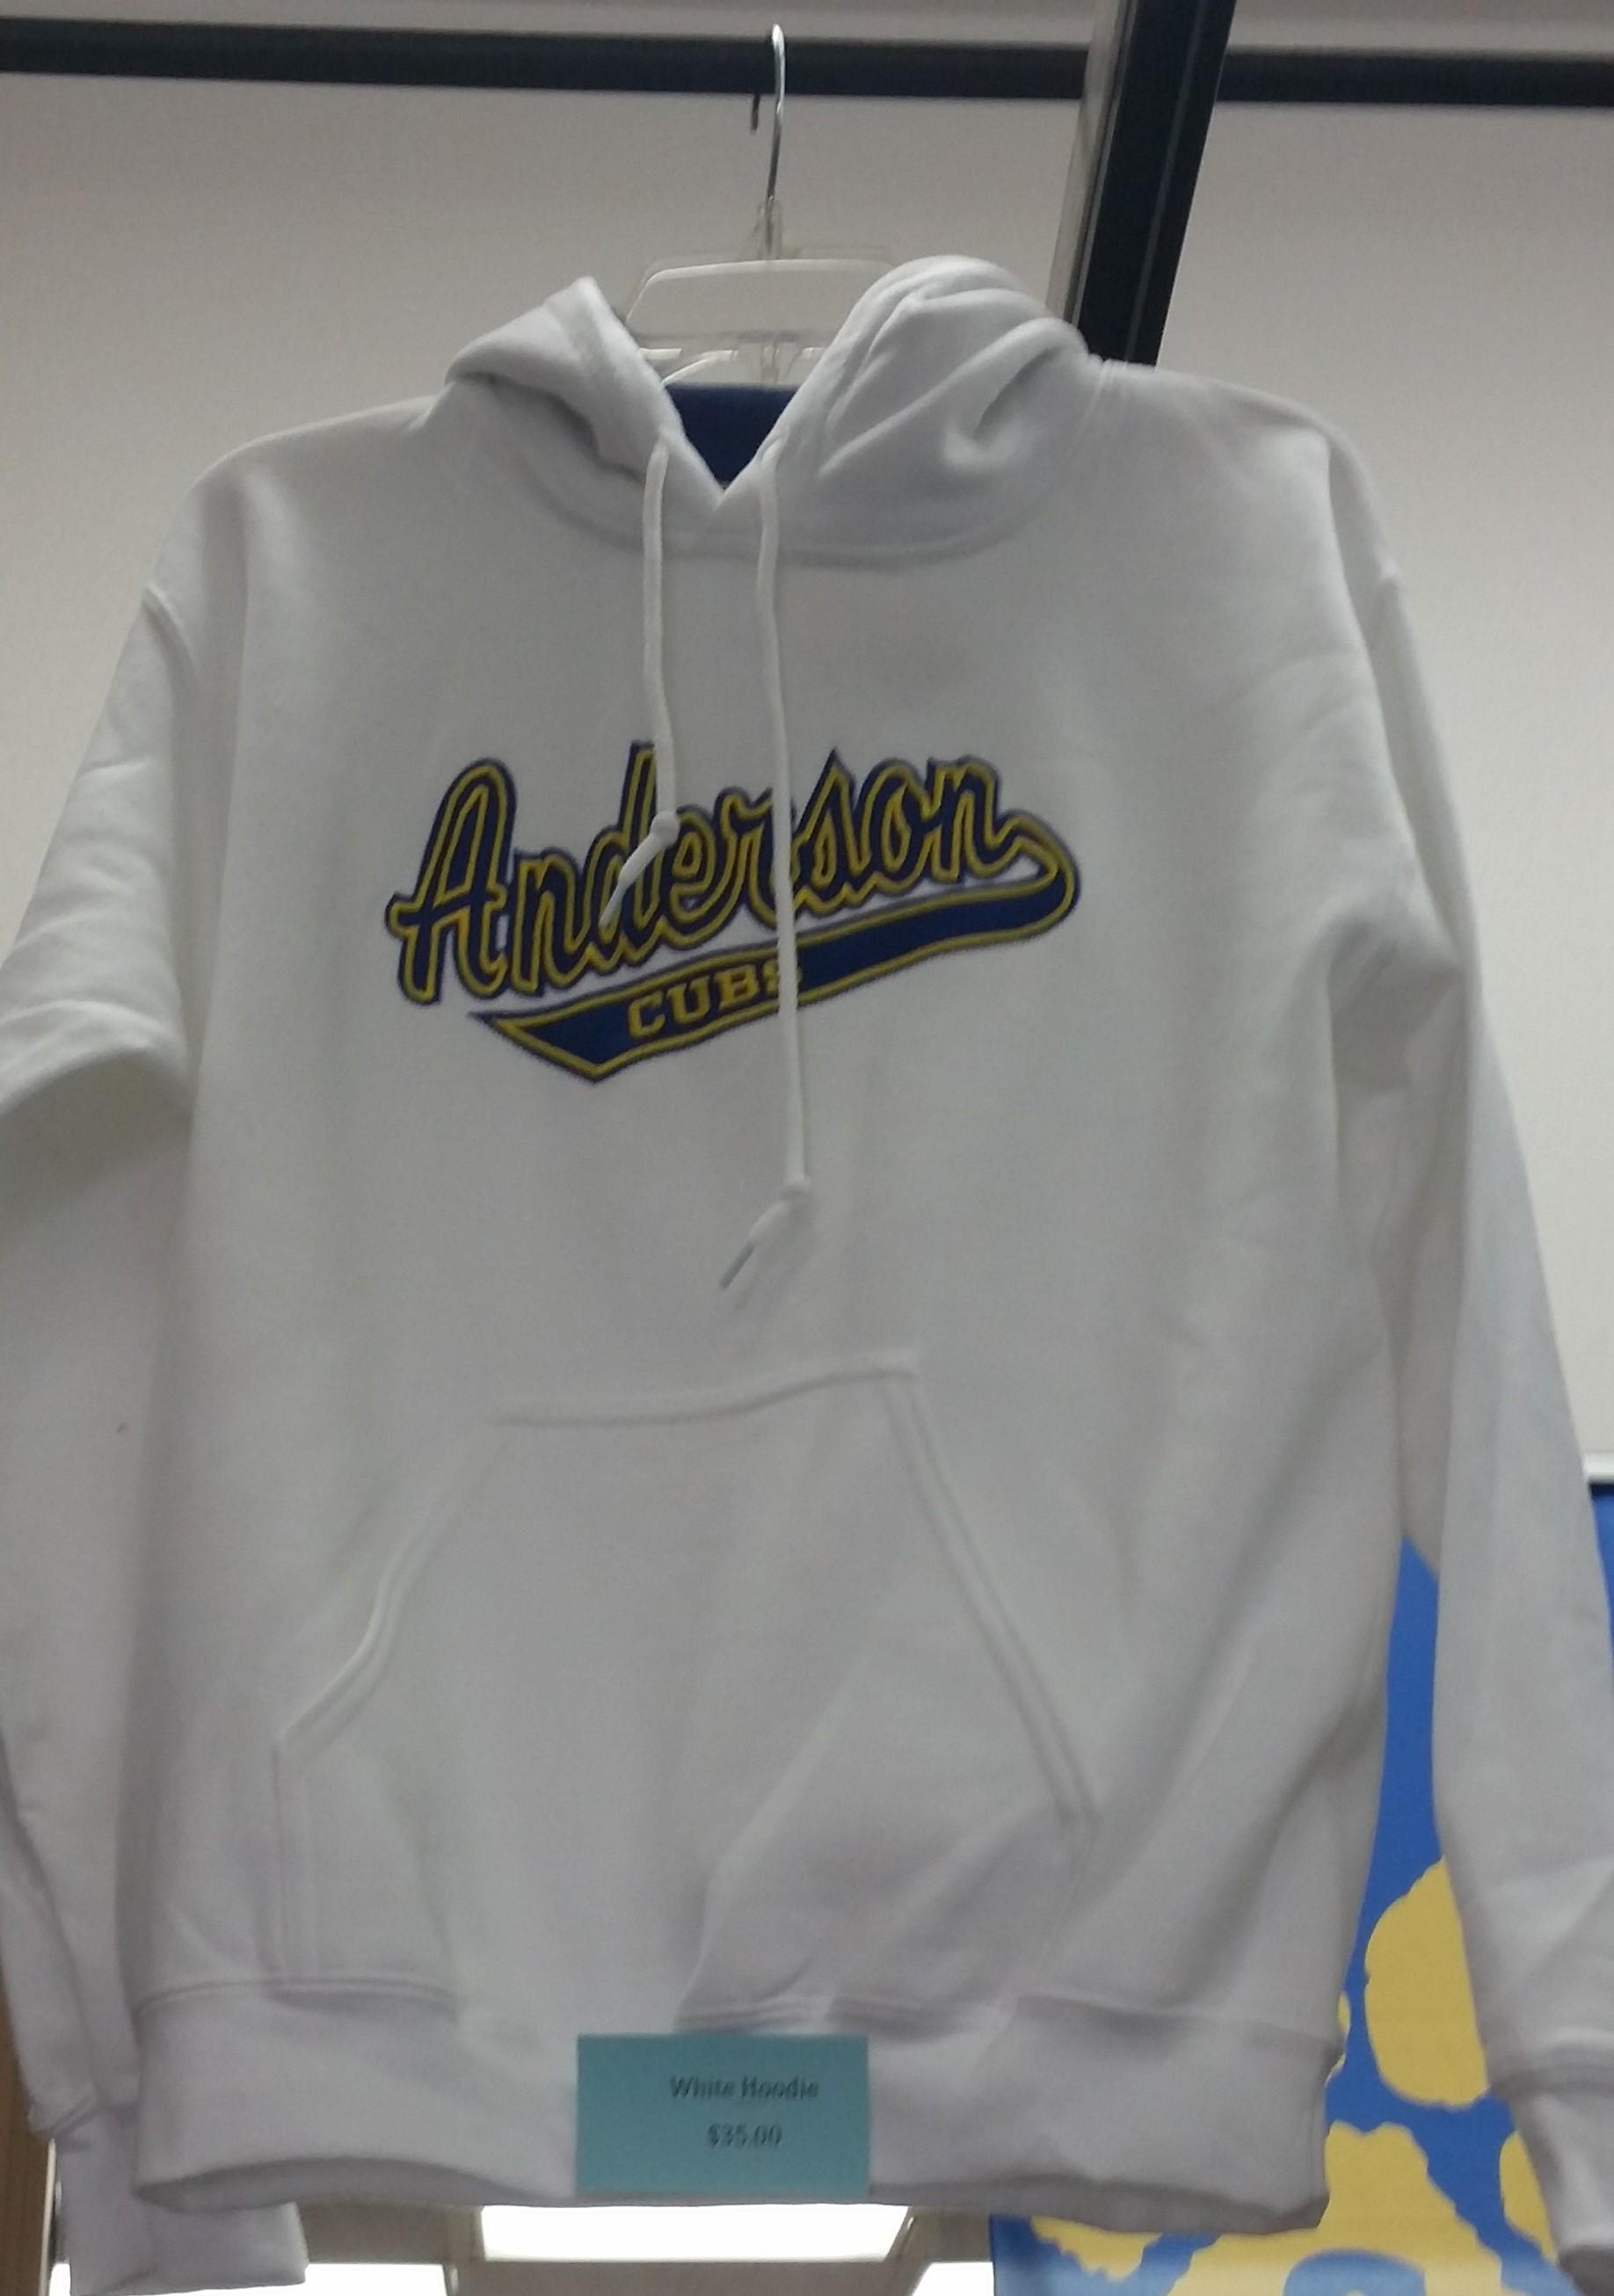 Anderson Cubs Sweatshirt - White